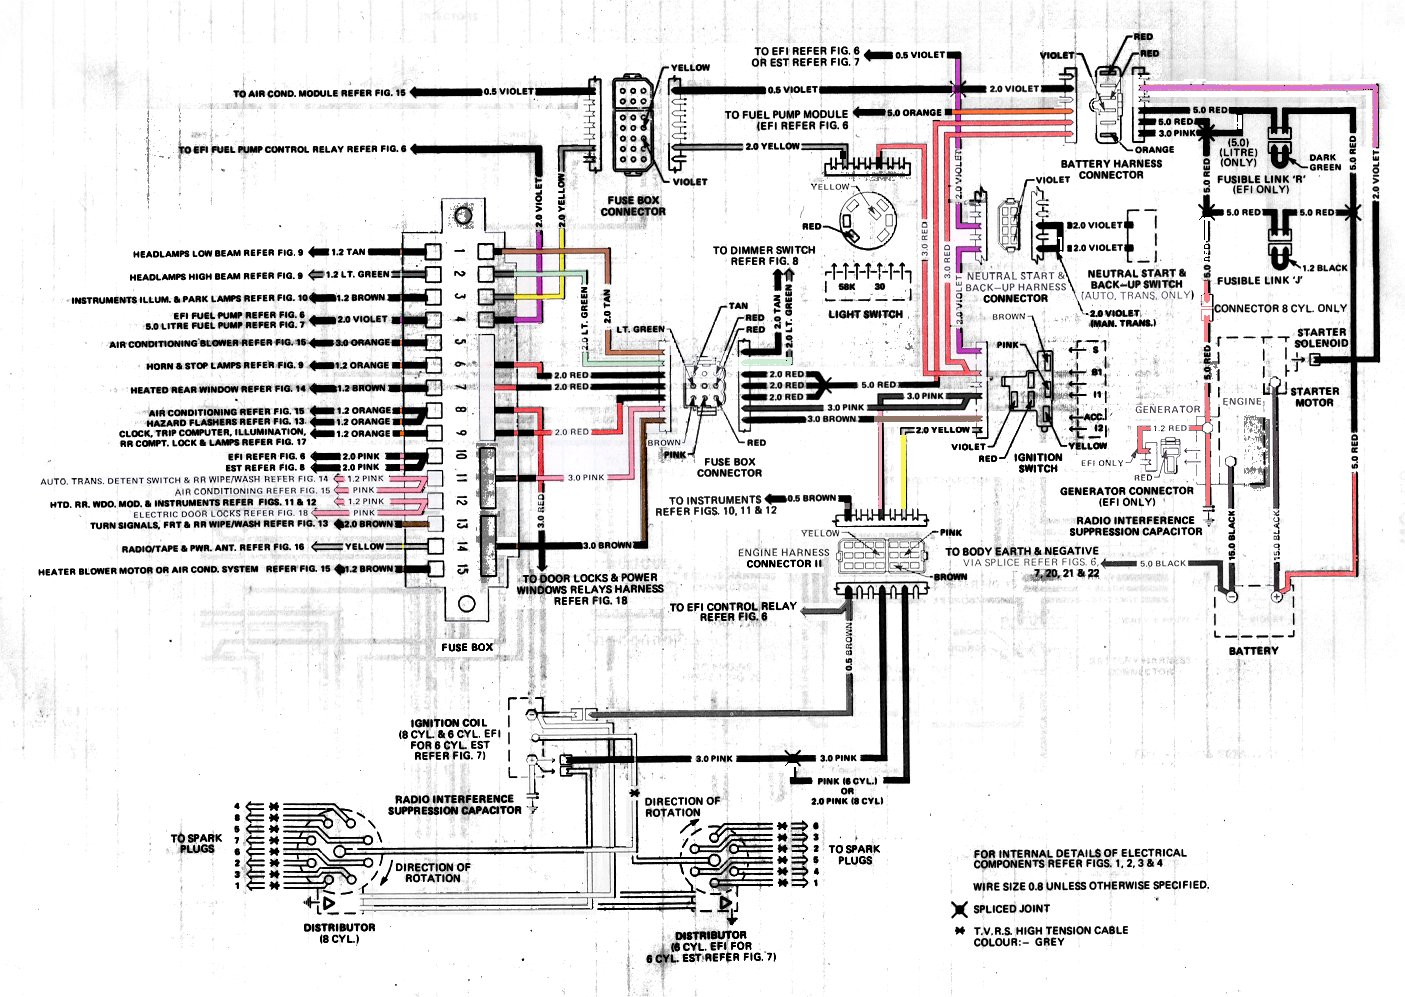 small resolution of free circuit simulator download circuit construction kit free download circuit simulator free download 3d origami diagram